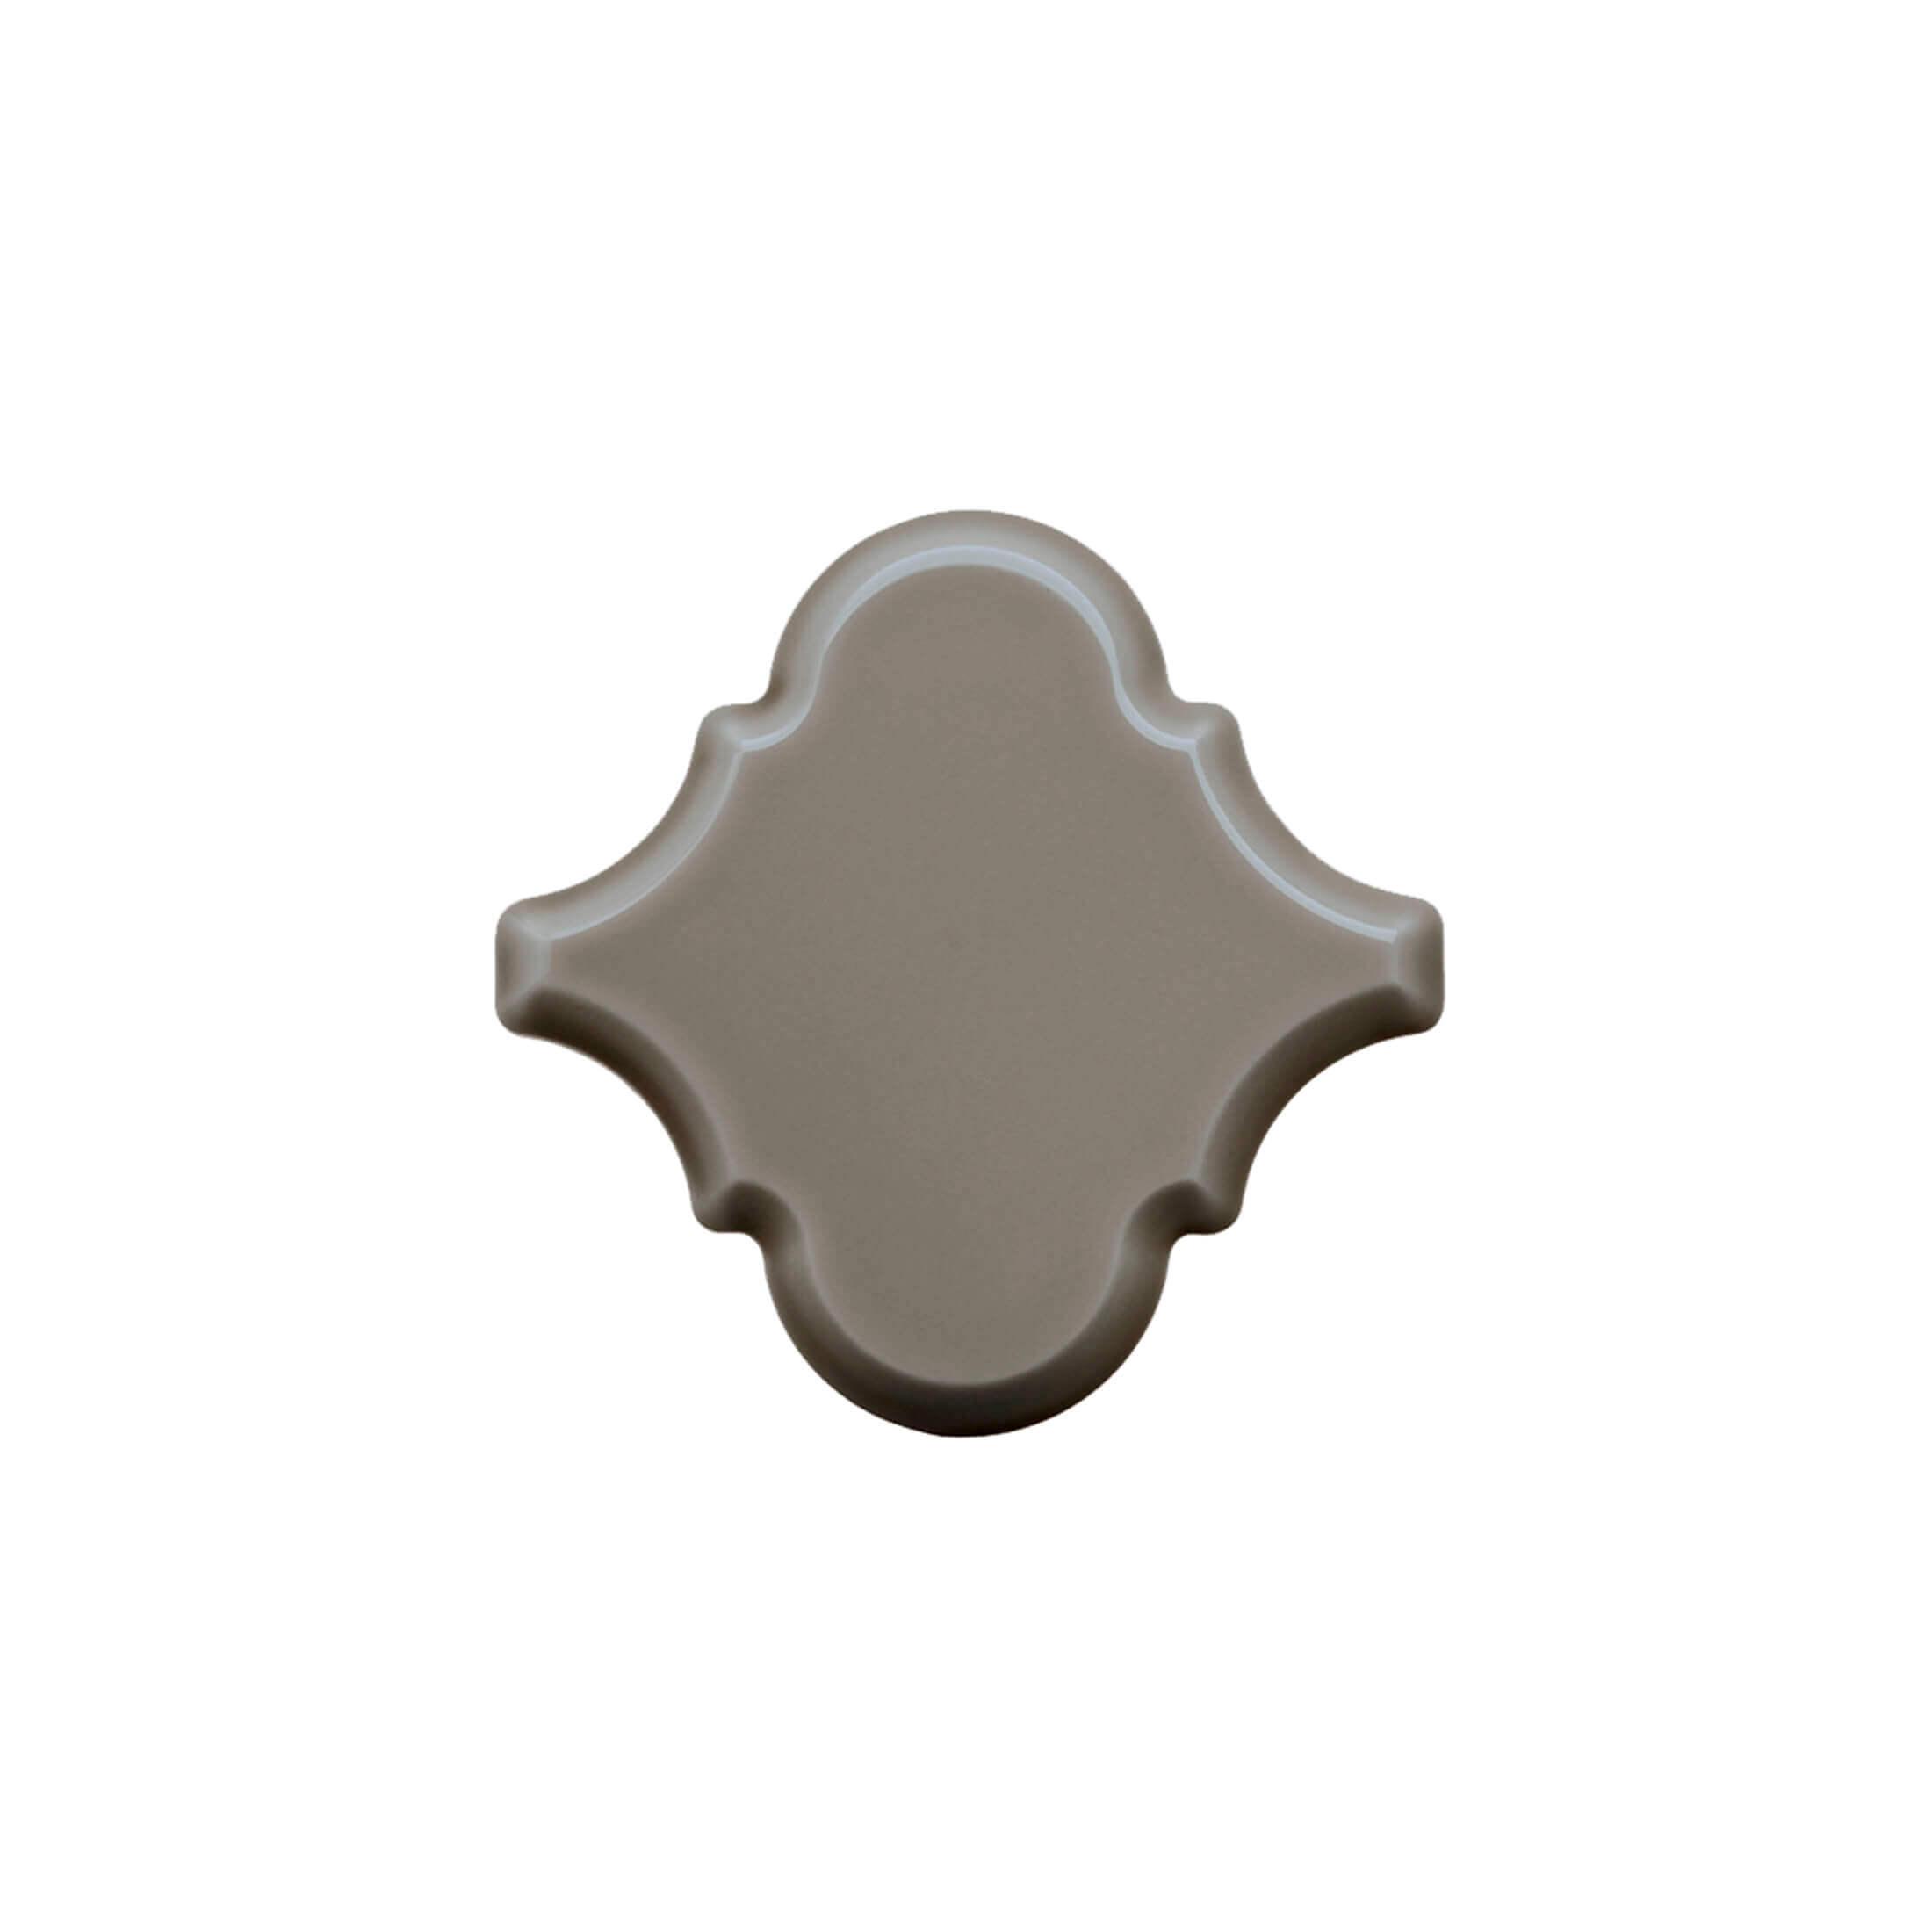 ADST8004 - ARABESCO EUCALYPTUS - 15 cm X 15 cm